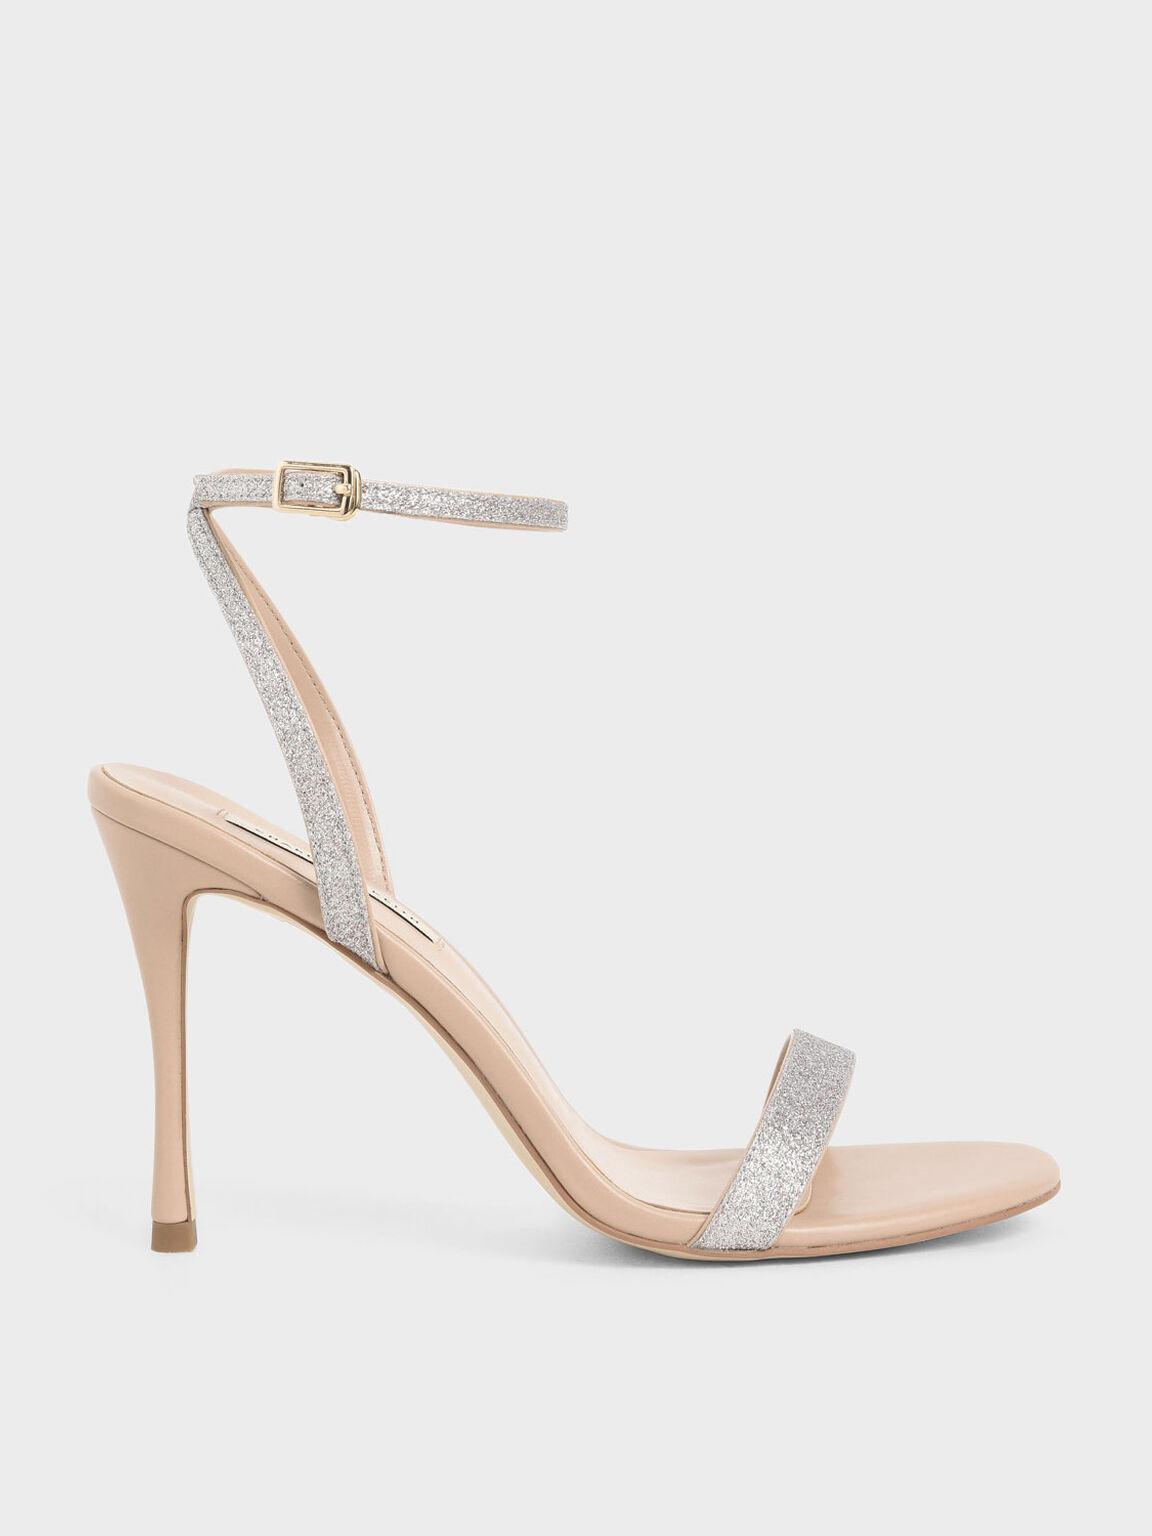 Glitter Ankle Strap Stiletto Heels, Silver, hi-res